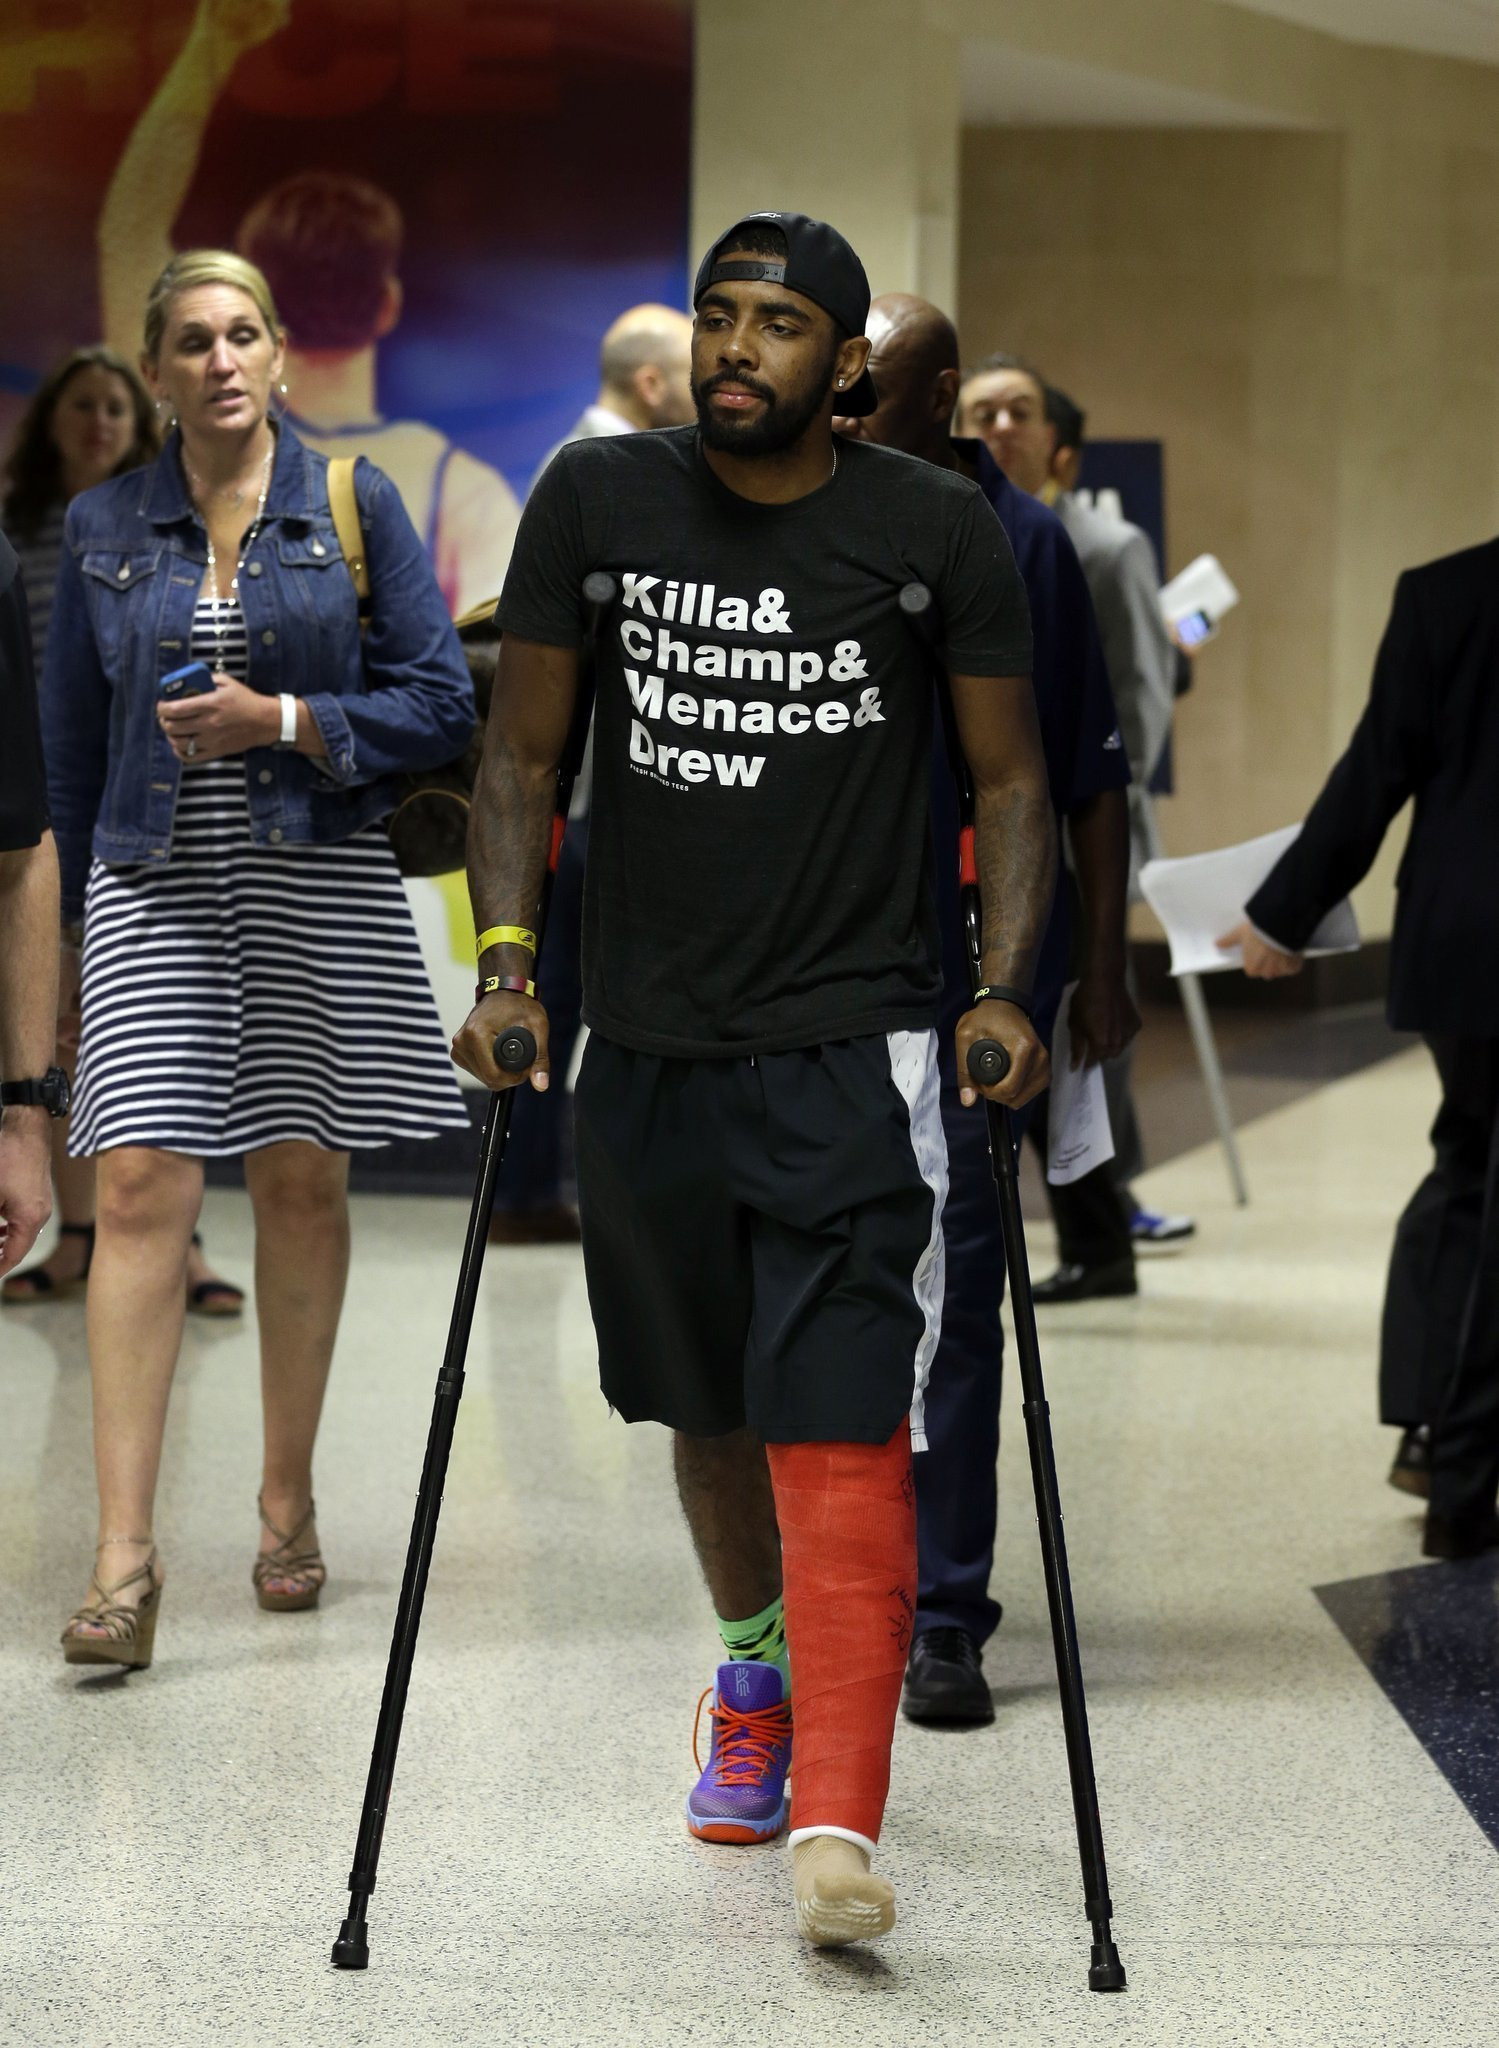 Cavs Point Guard Irving Calls Kneecap Injury A Freak Play The San Diego Union Tribune